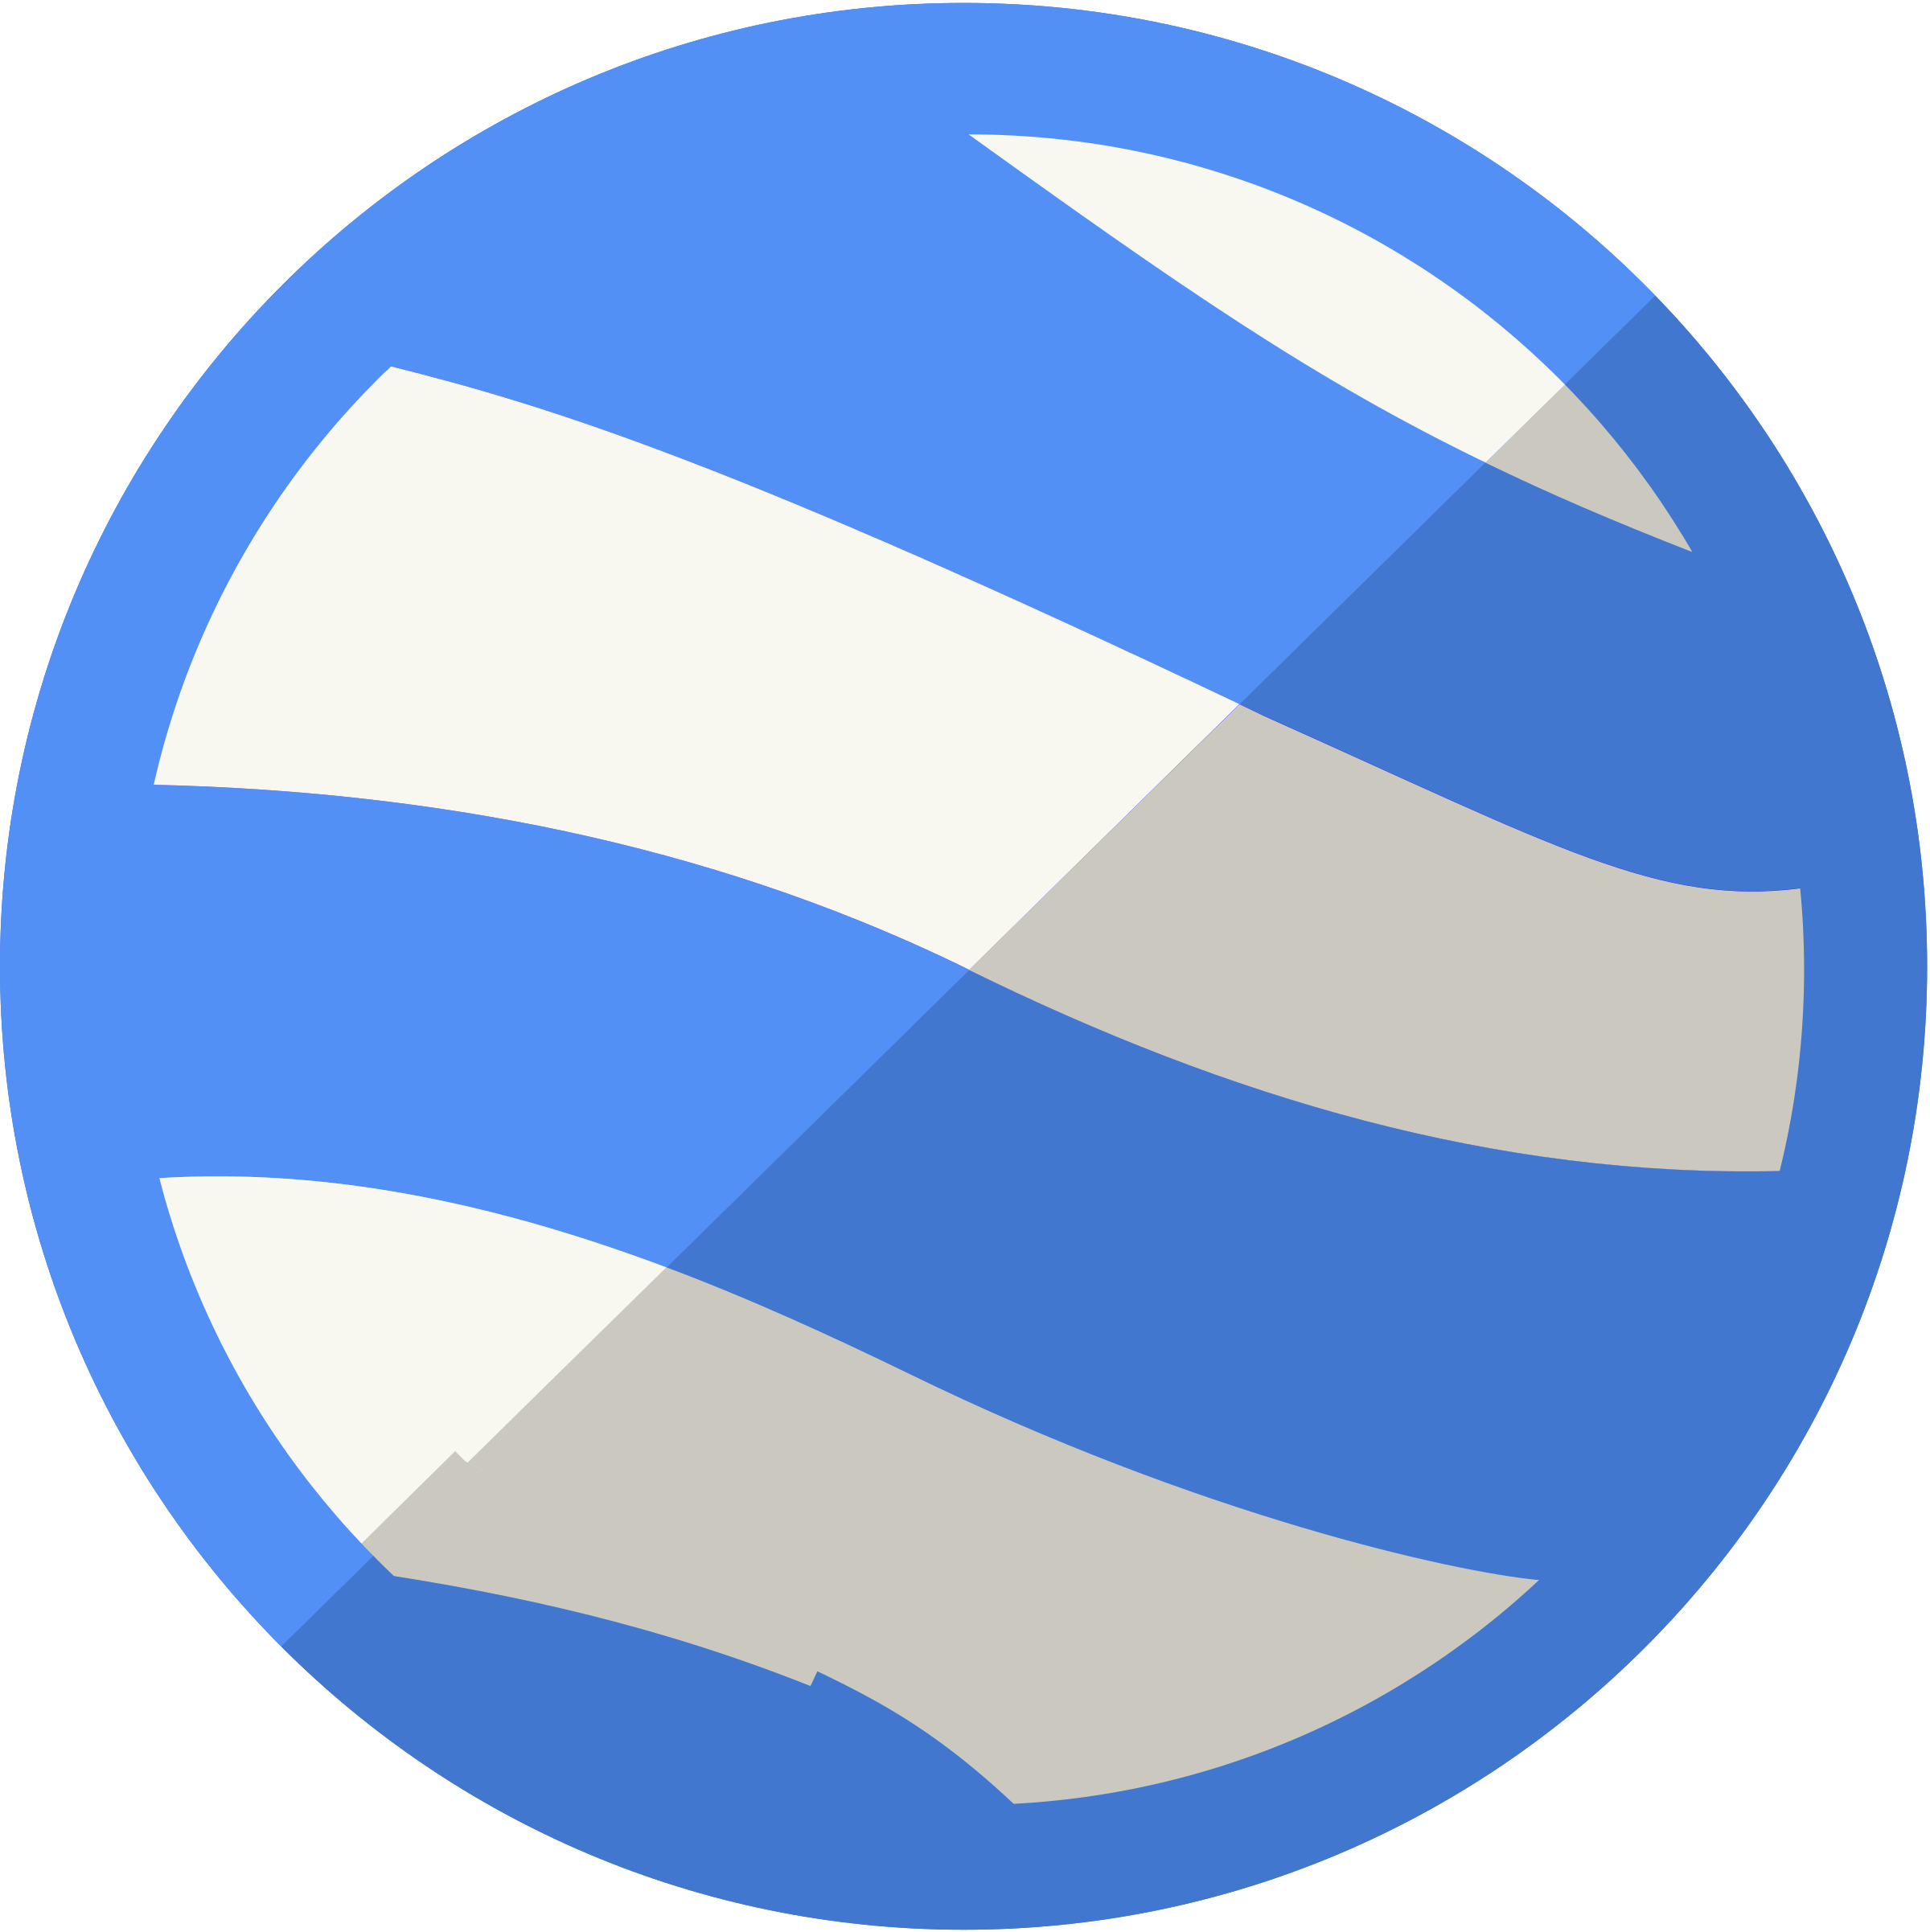 Google Earth Logo PNG Transparent & SVG Vector.